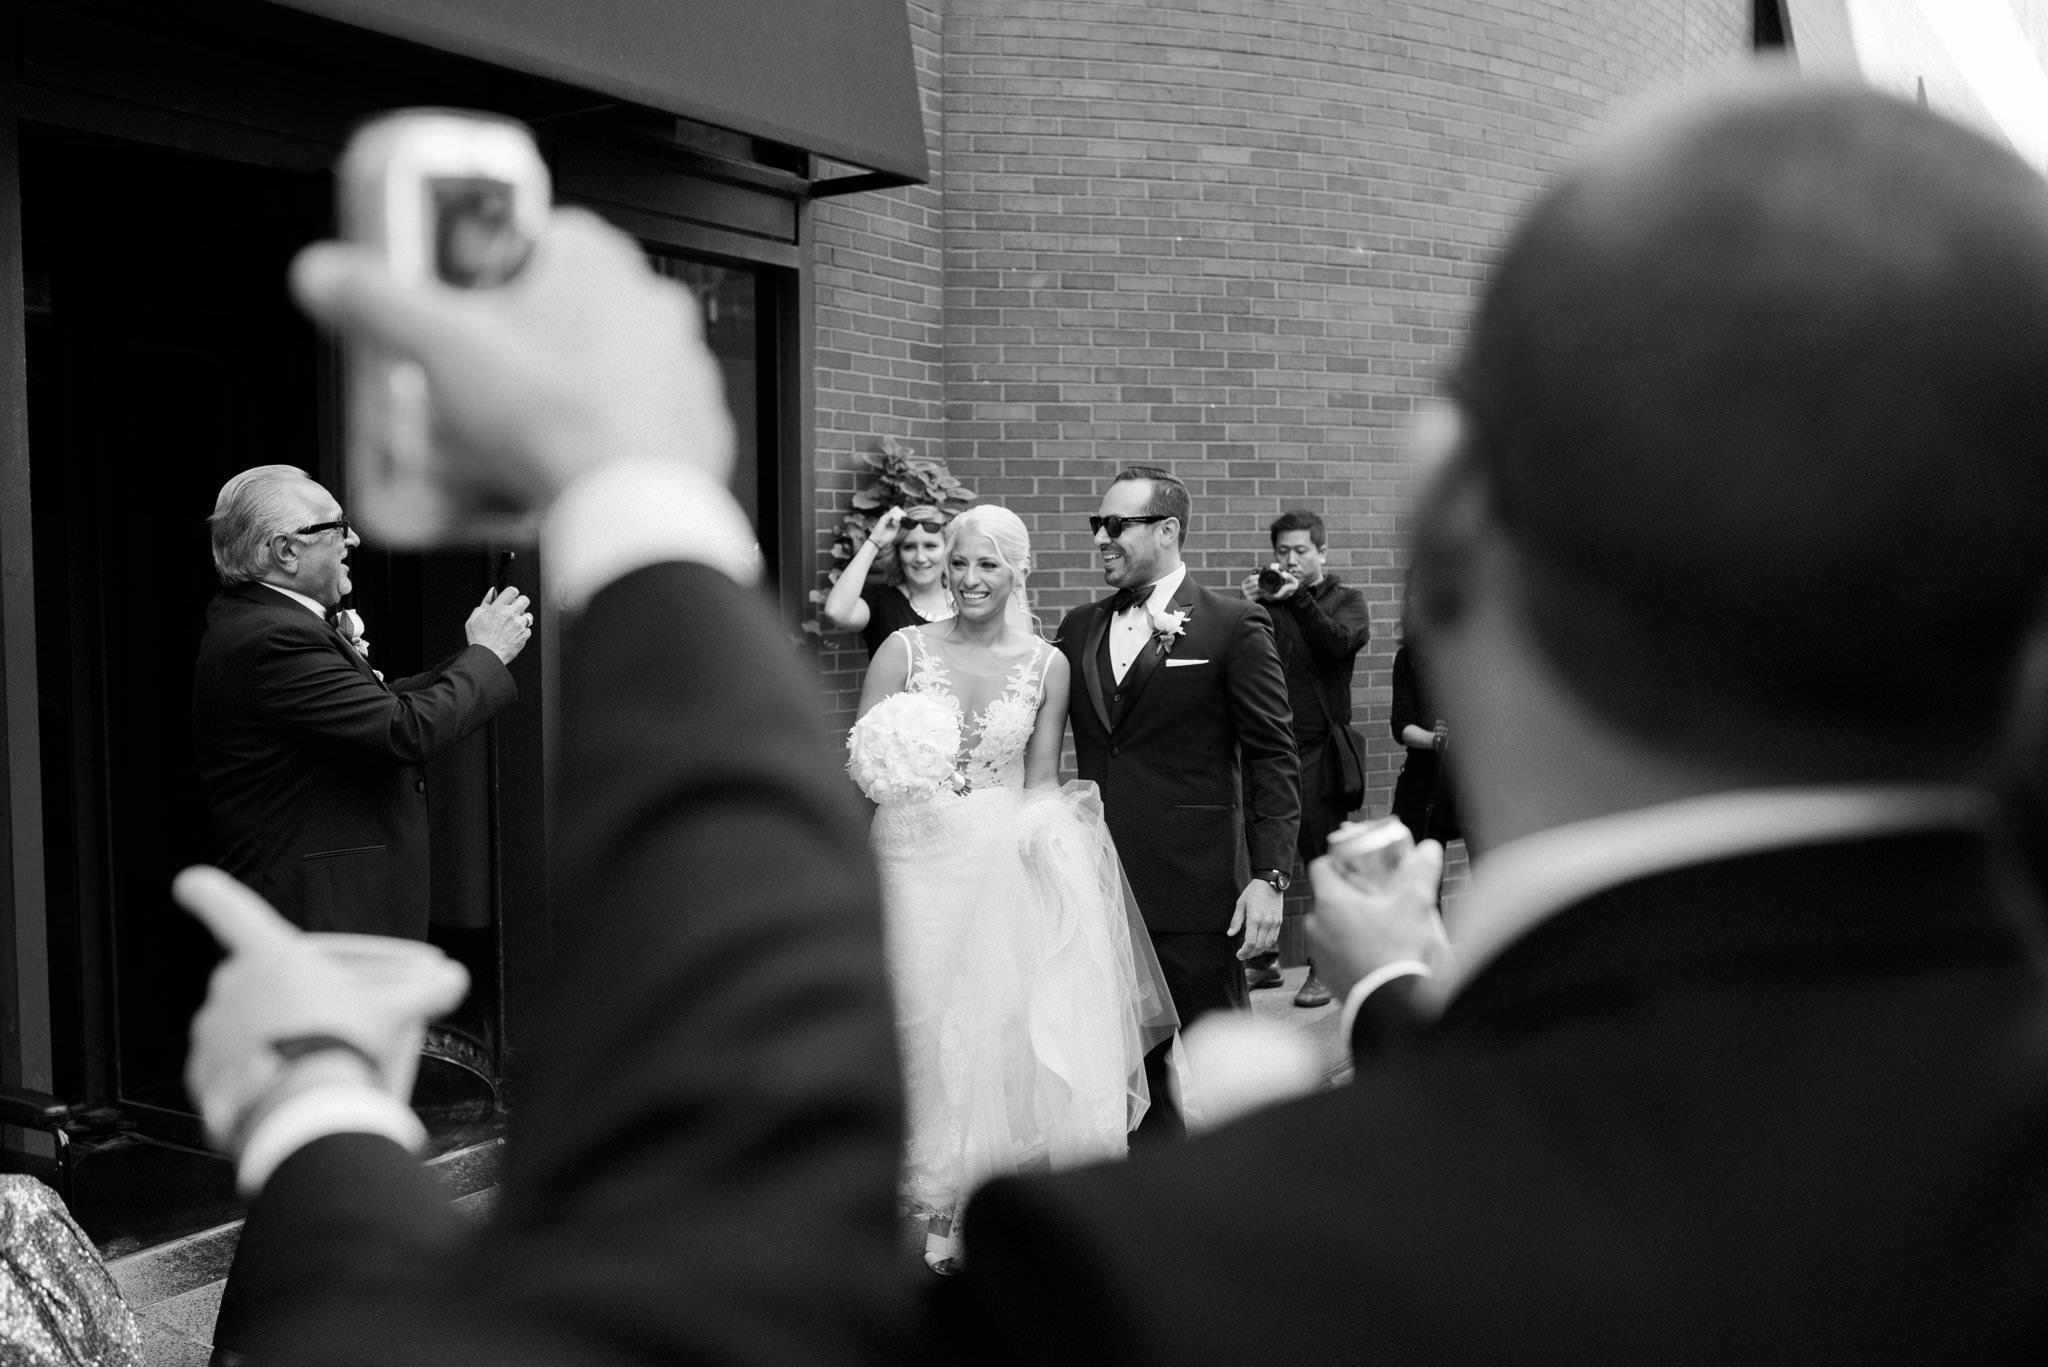 Adler-Planetarium-Chicago-Wedding-Photography-0026.JPG